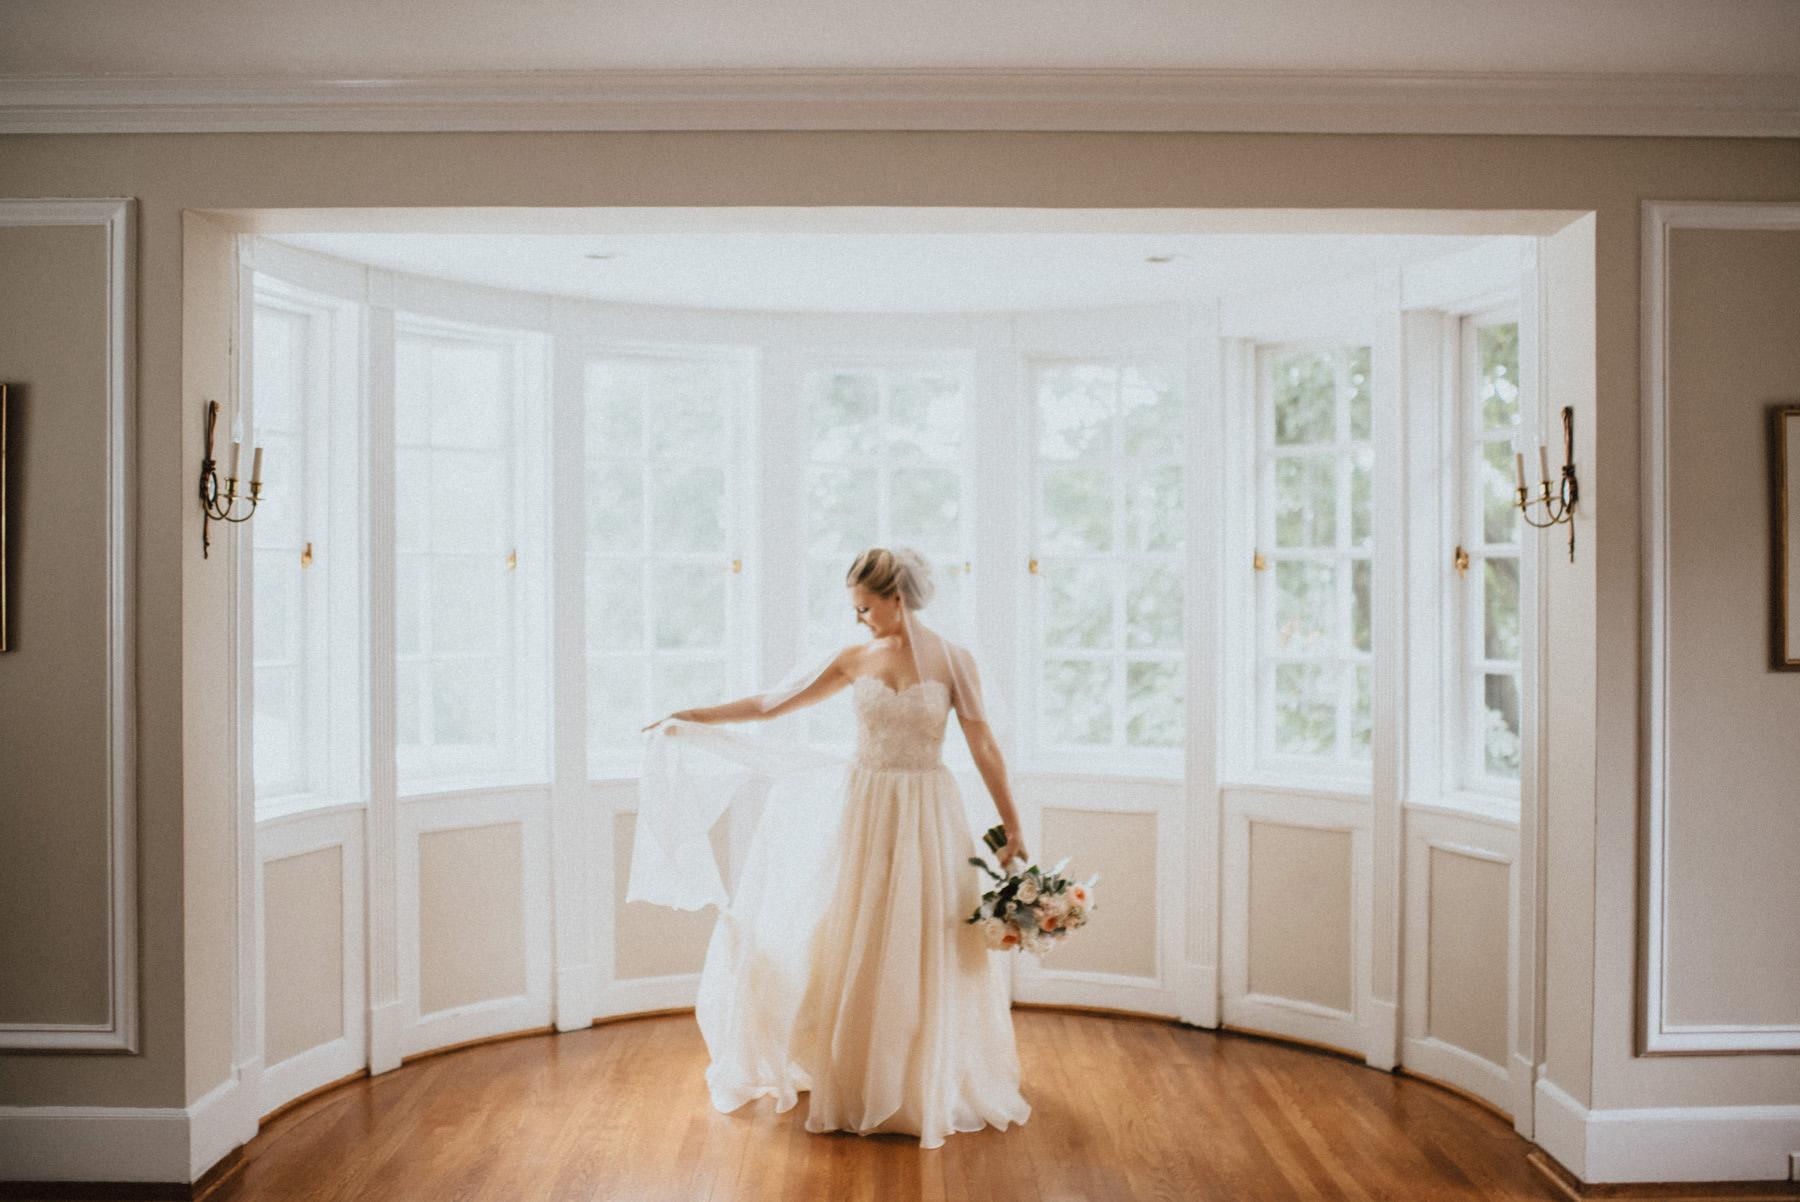 052-greenville-country-club-wedding-2-2.jpg